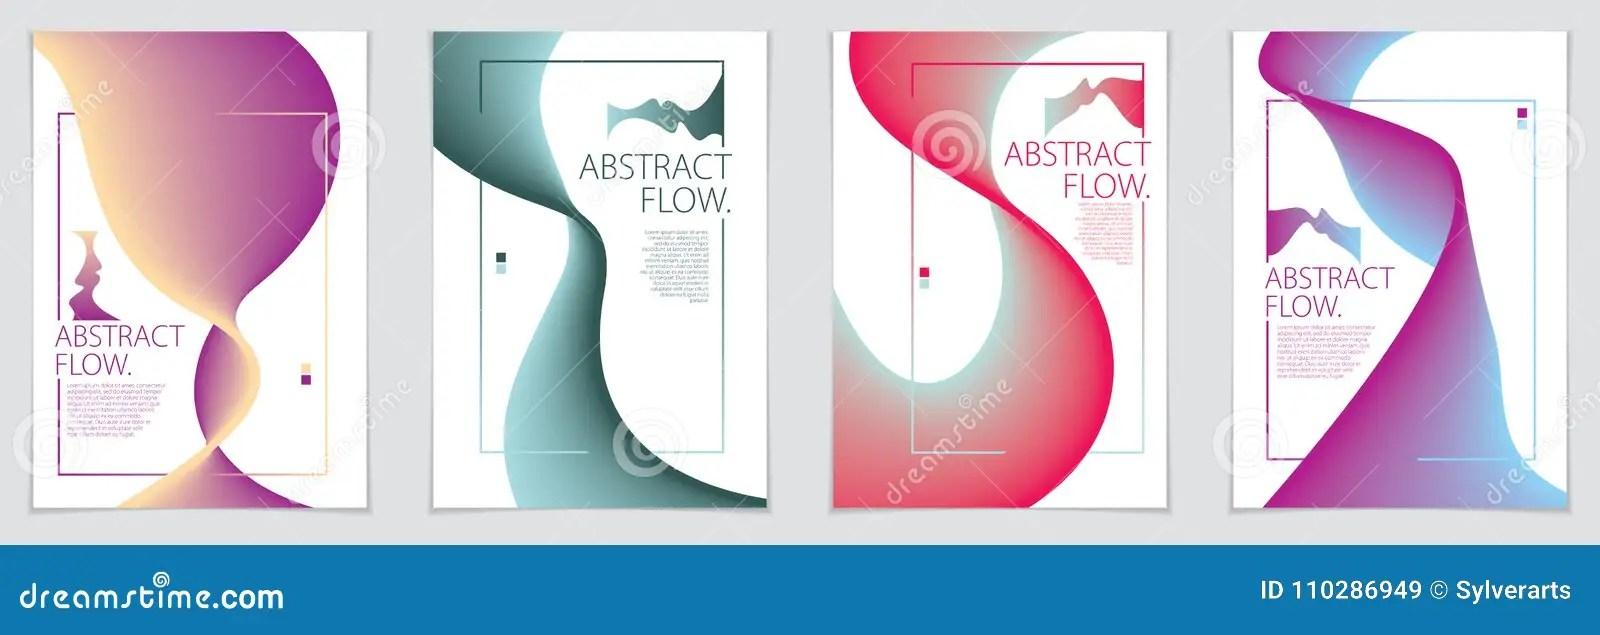 Abstract Flow Fluid Shape Vector Backgrounds Set A4 Print Format